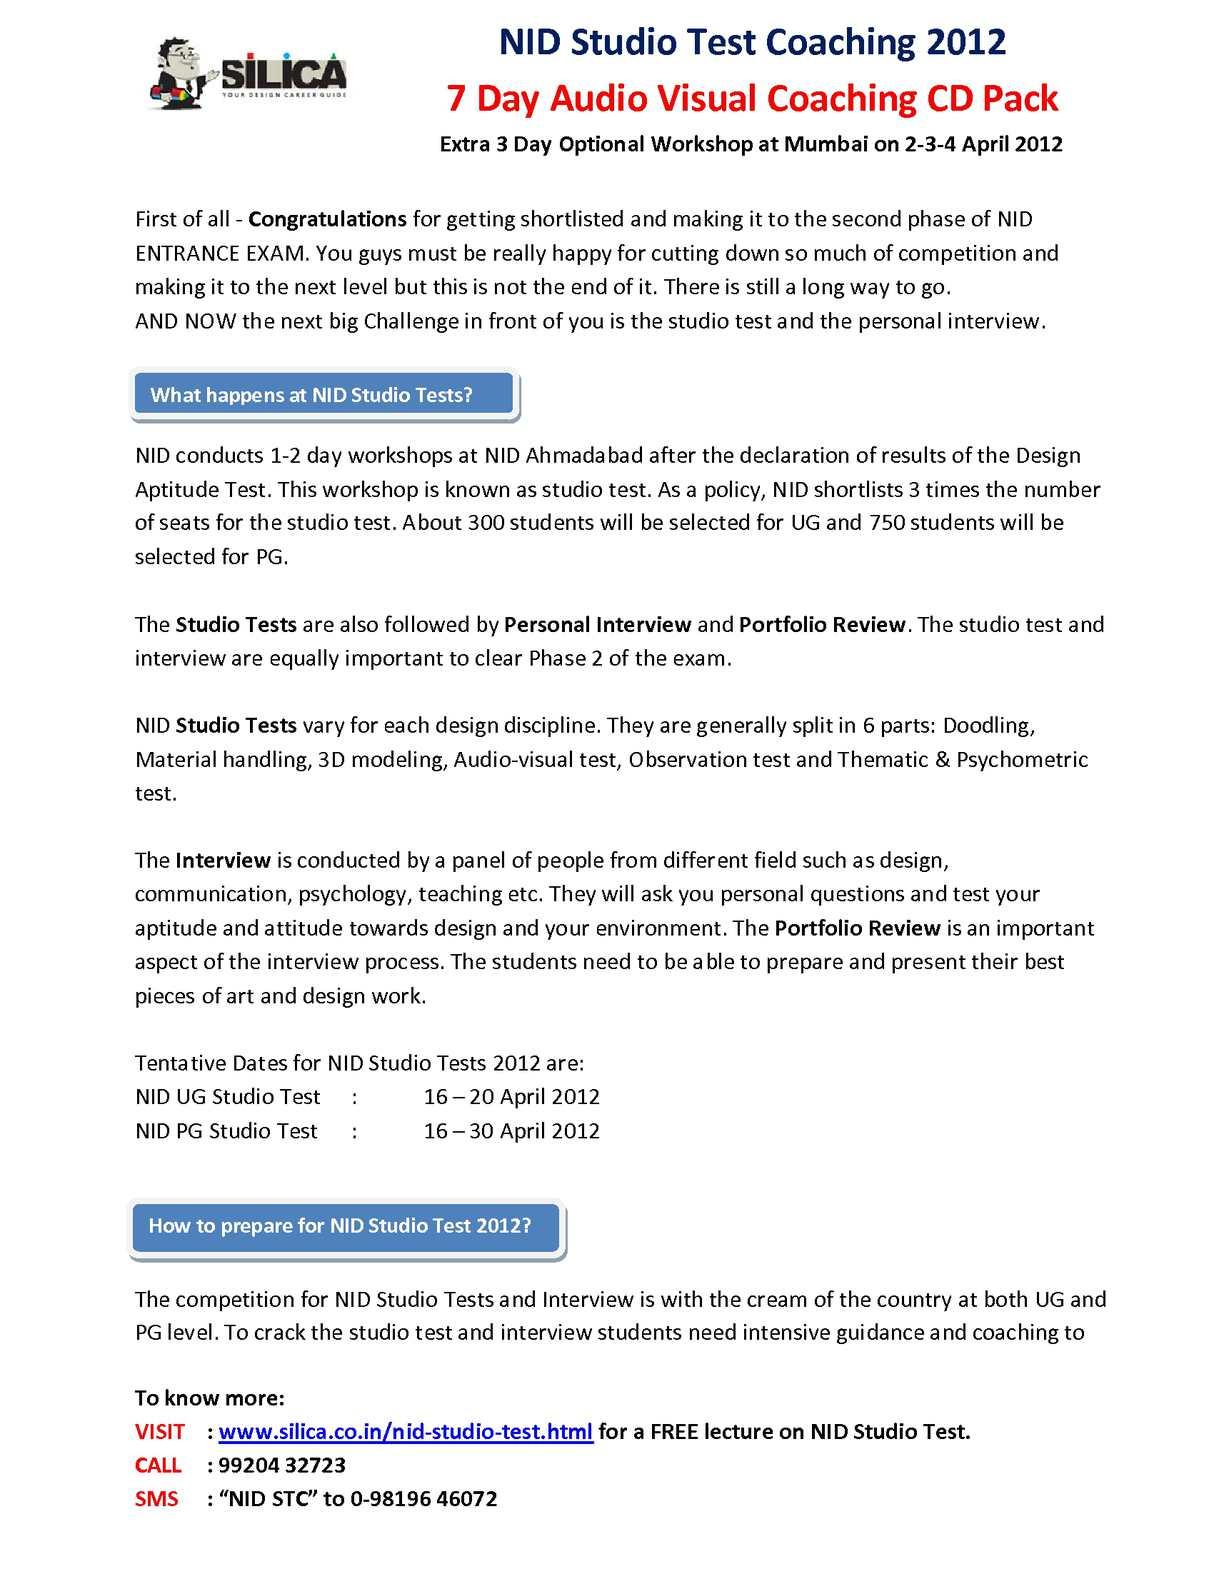 Calaméo - NID Studio Test Sample Papers|NID Studio